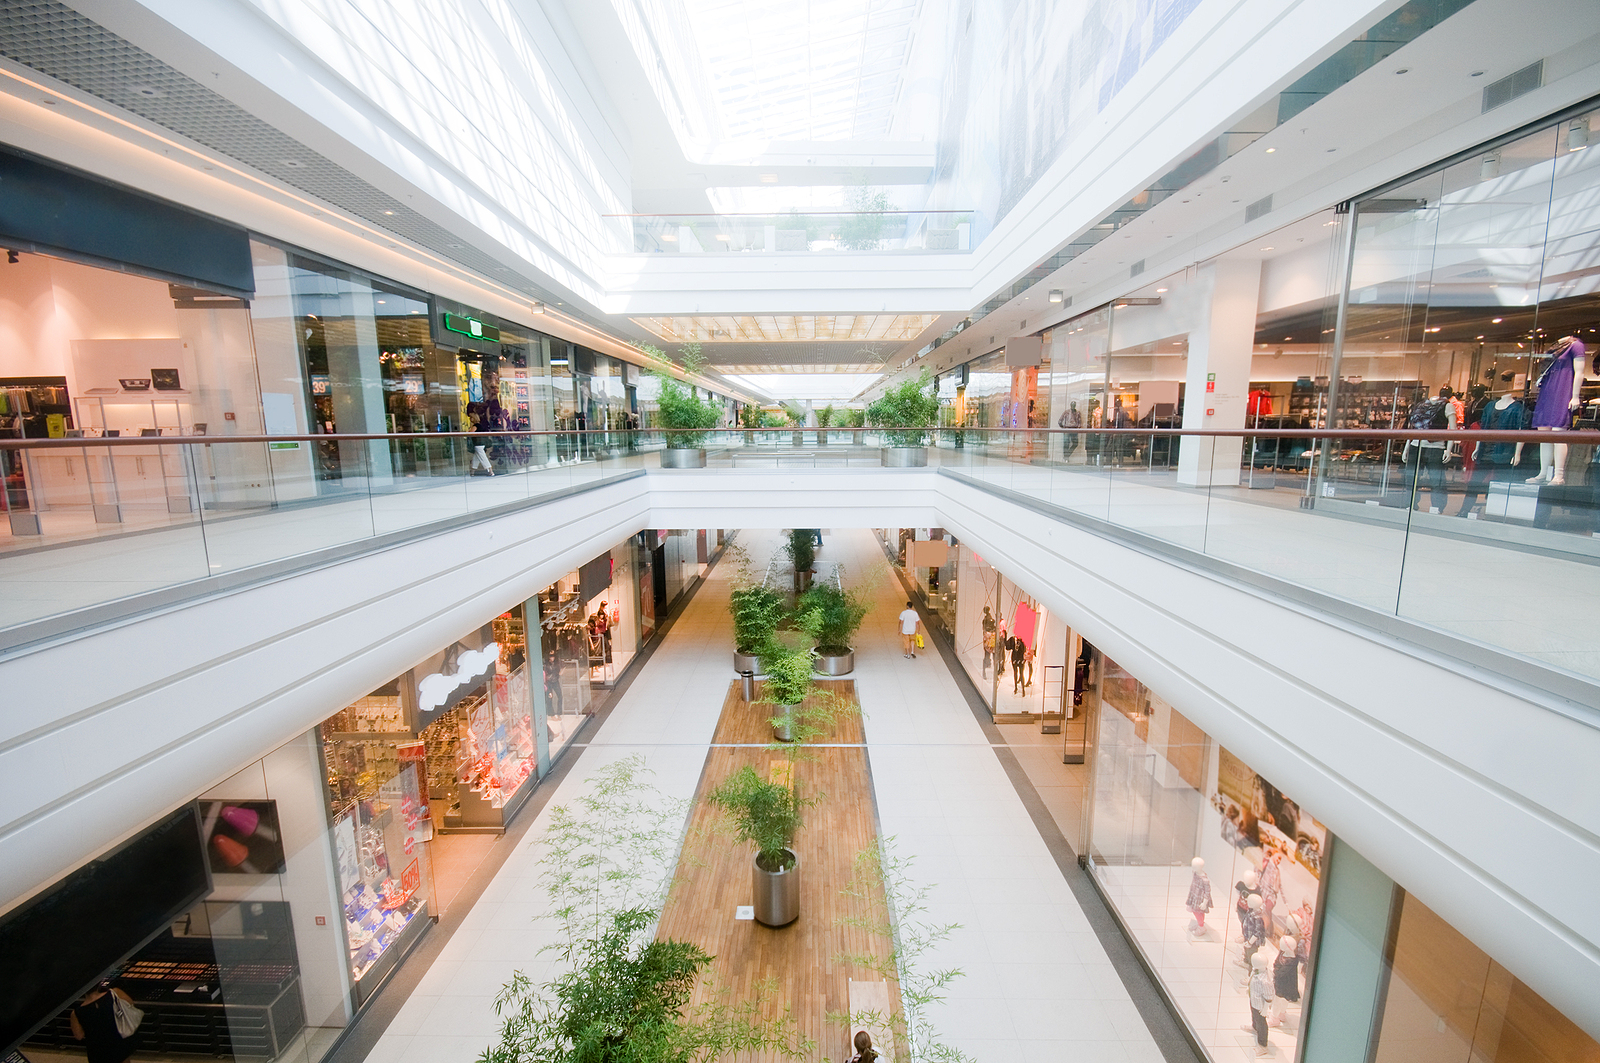 Galerie handlowe otwarte od 4 maja